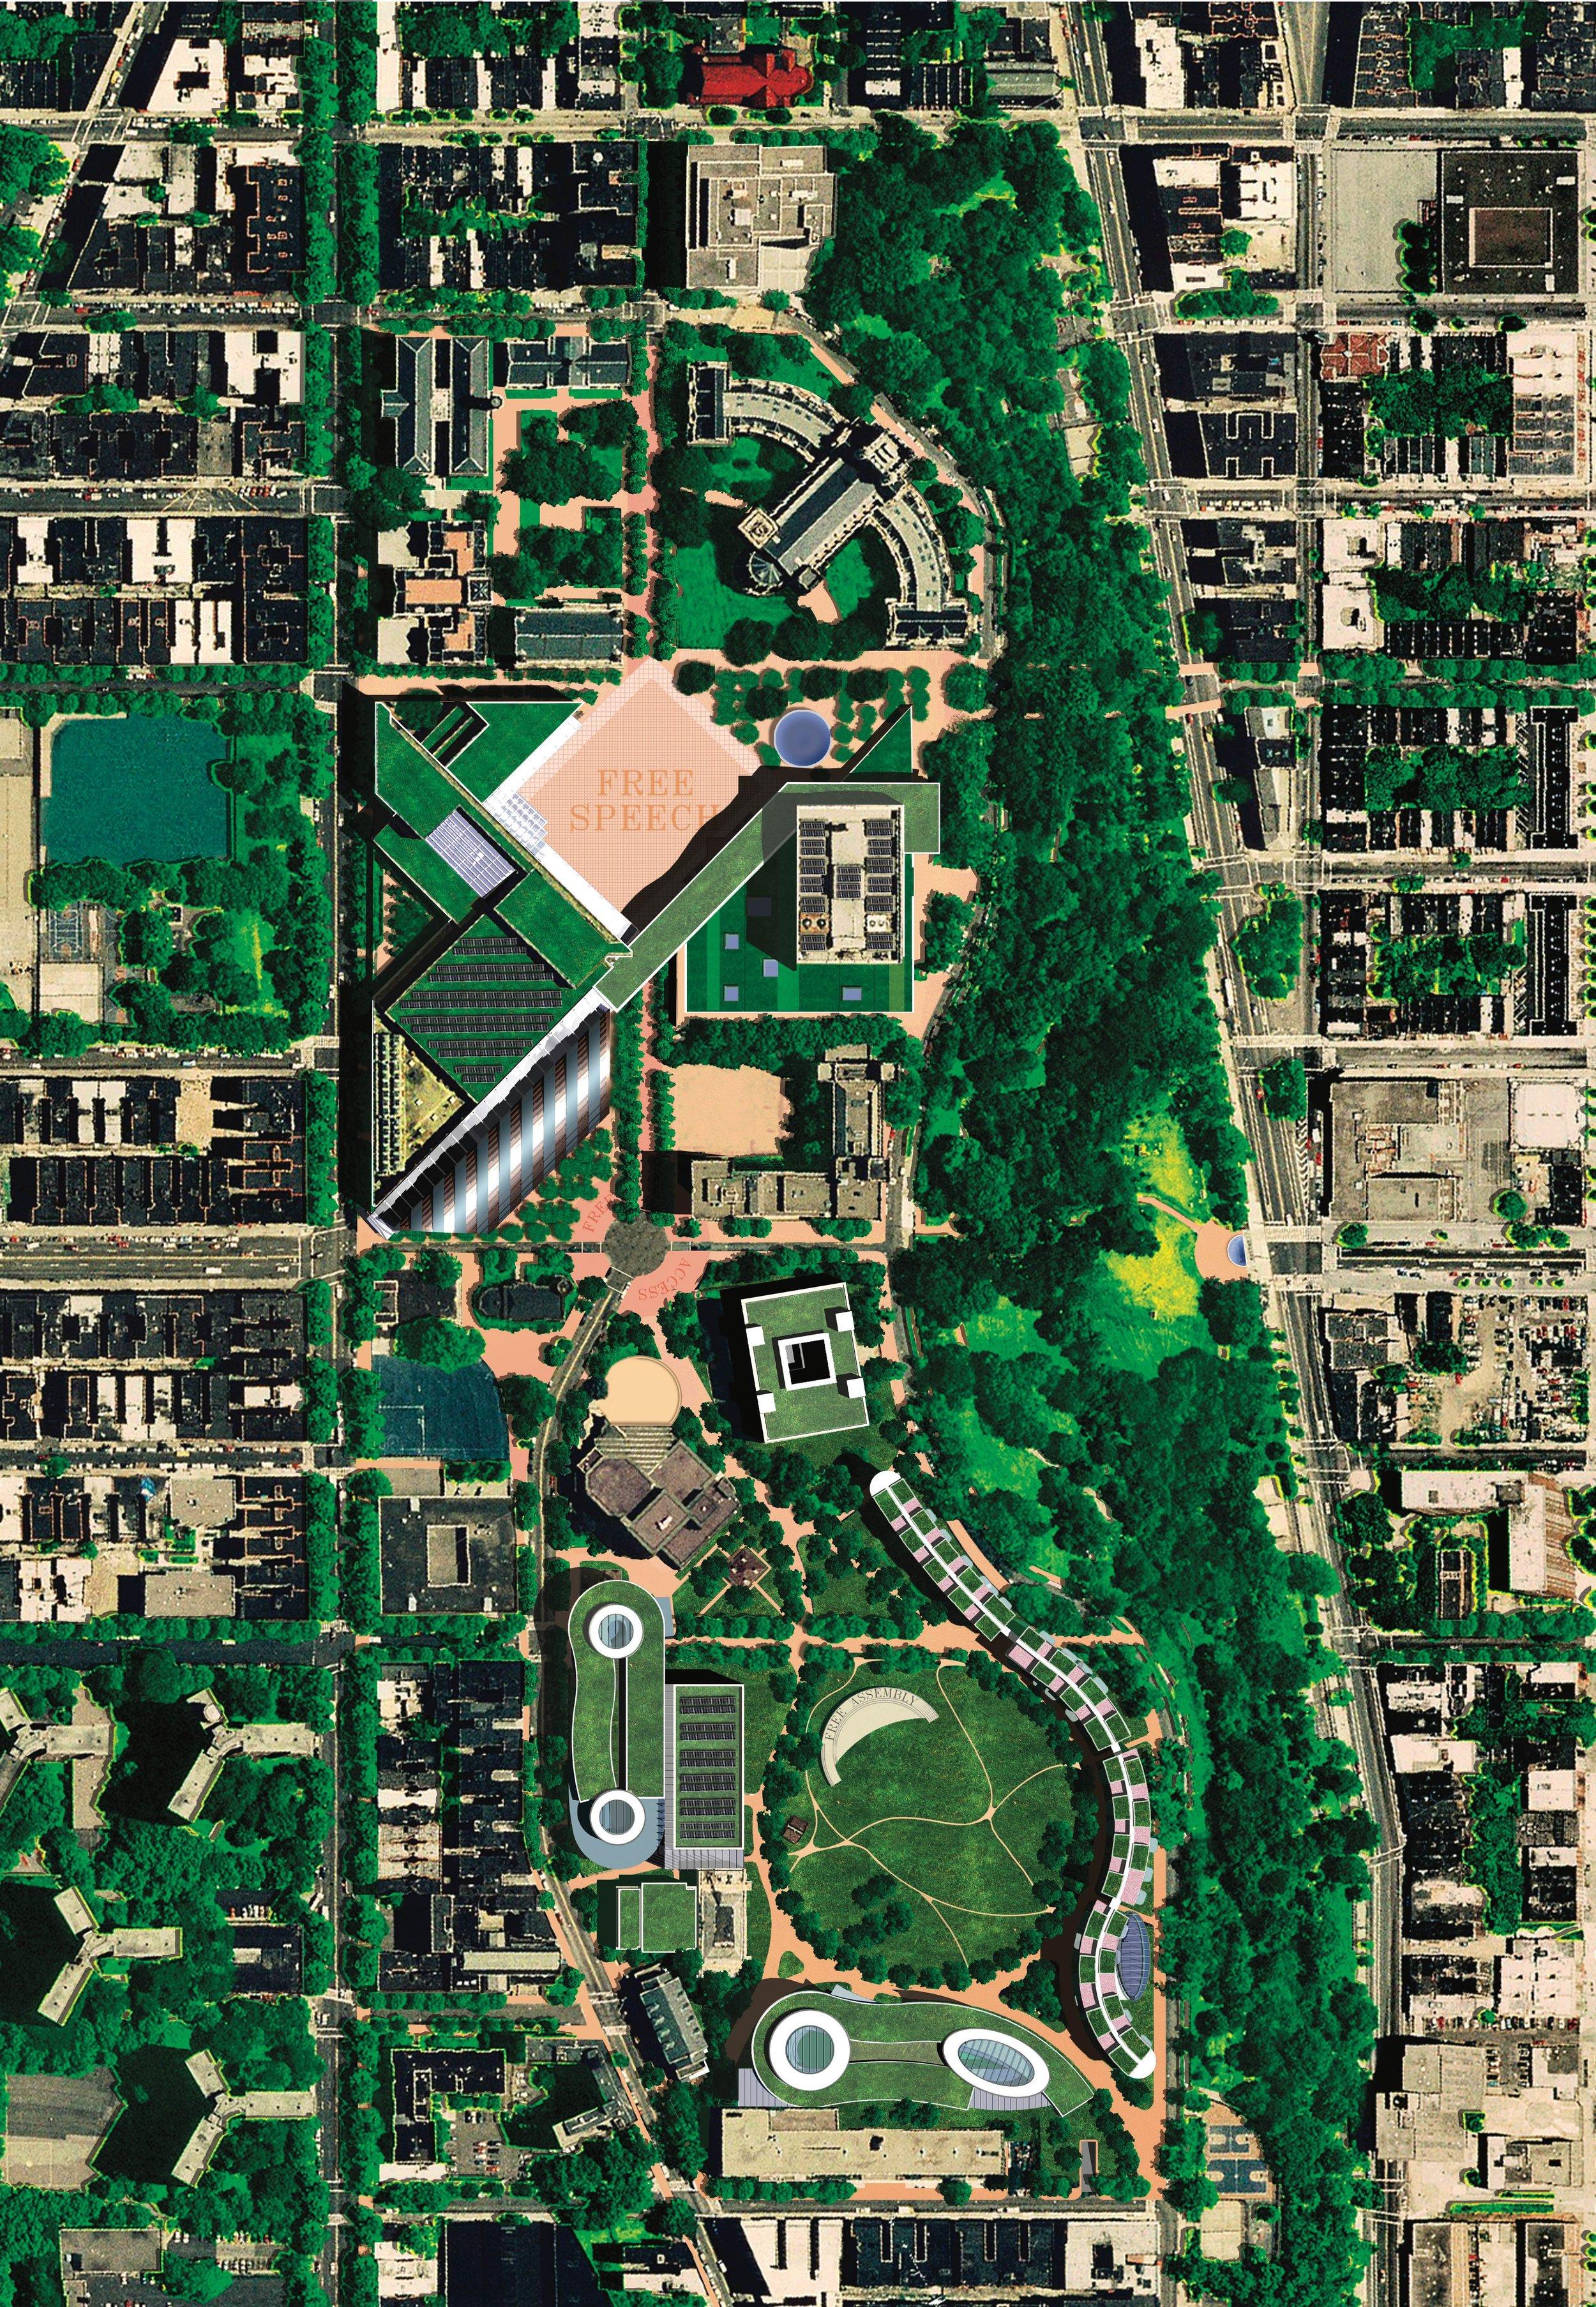 CCNY_Campus Plan.jpg